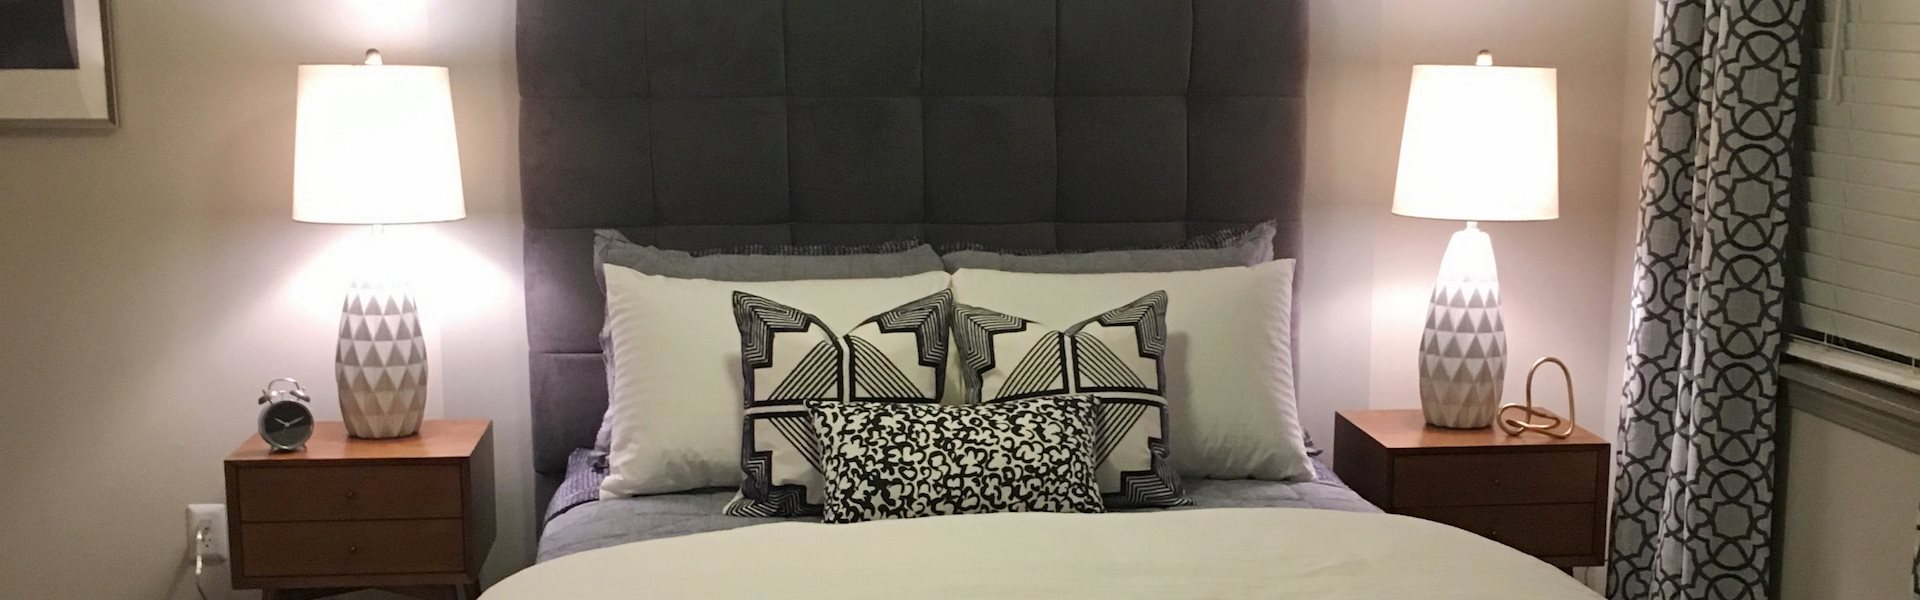 Newly upgraded studio bedroom at Tara Garden Apartments in Huntsville, AL